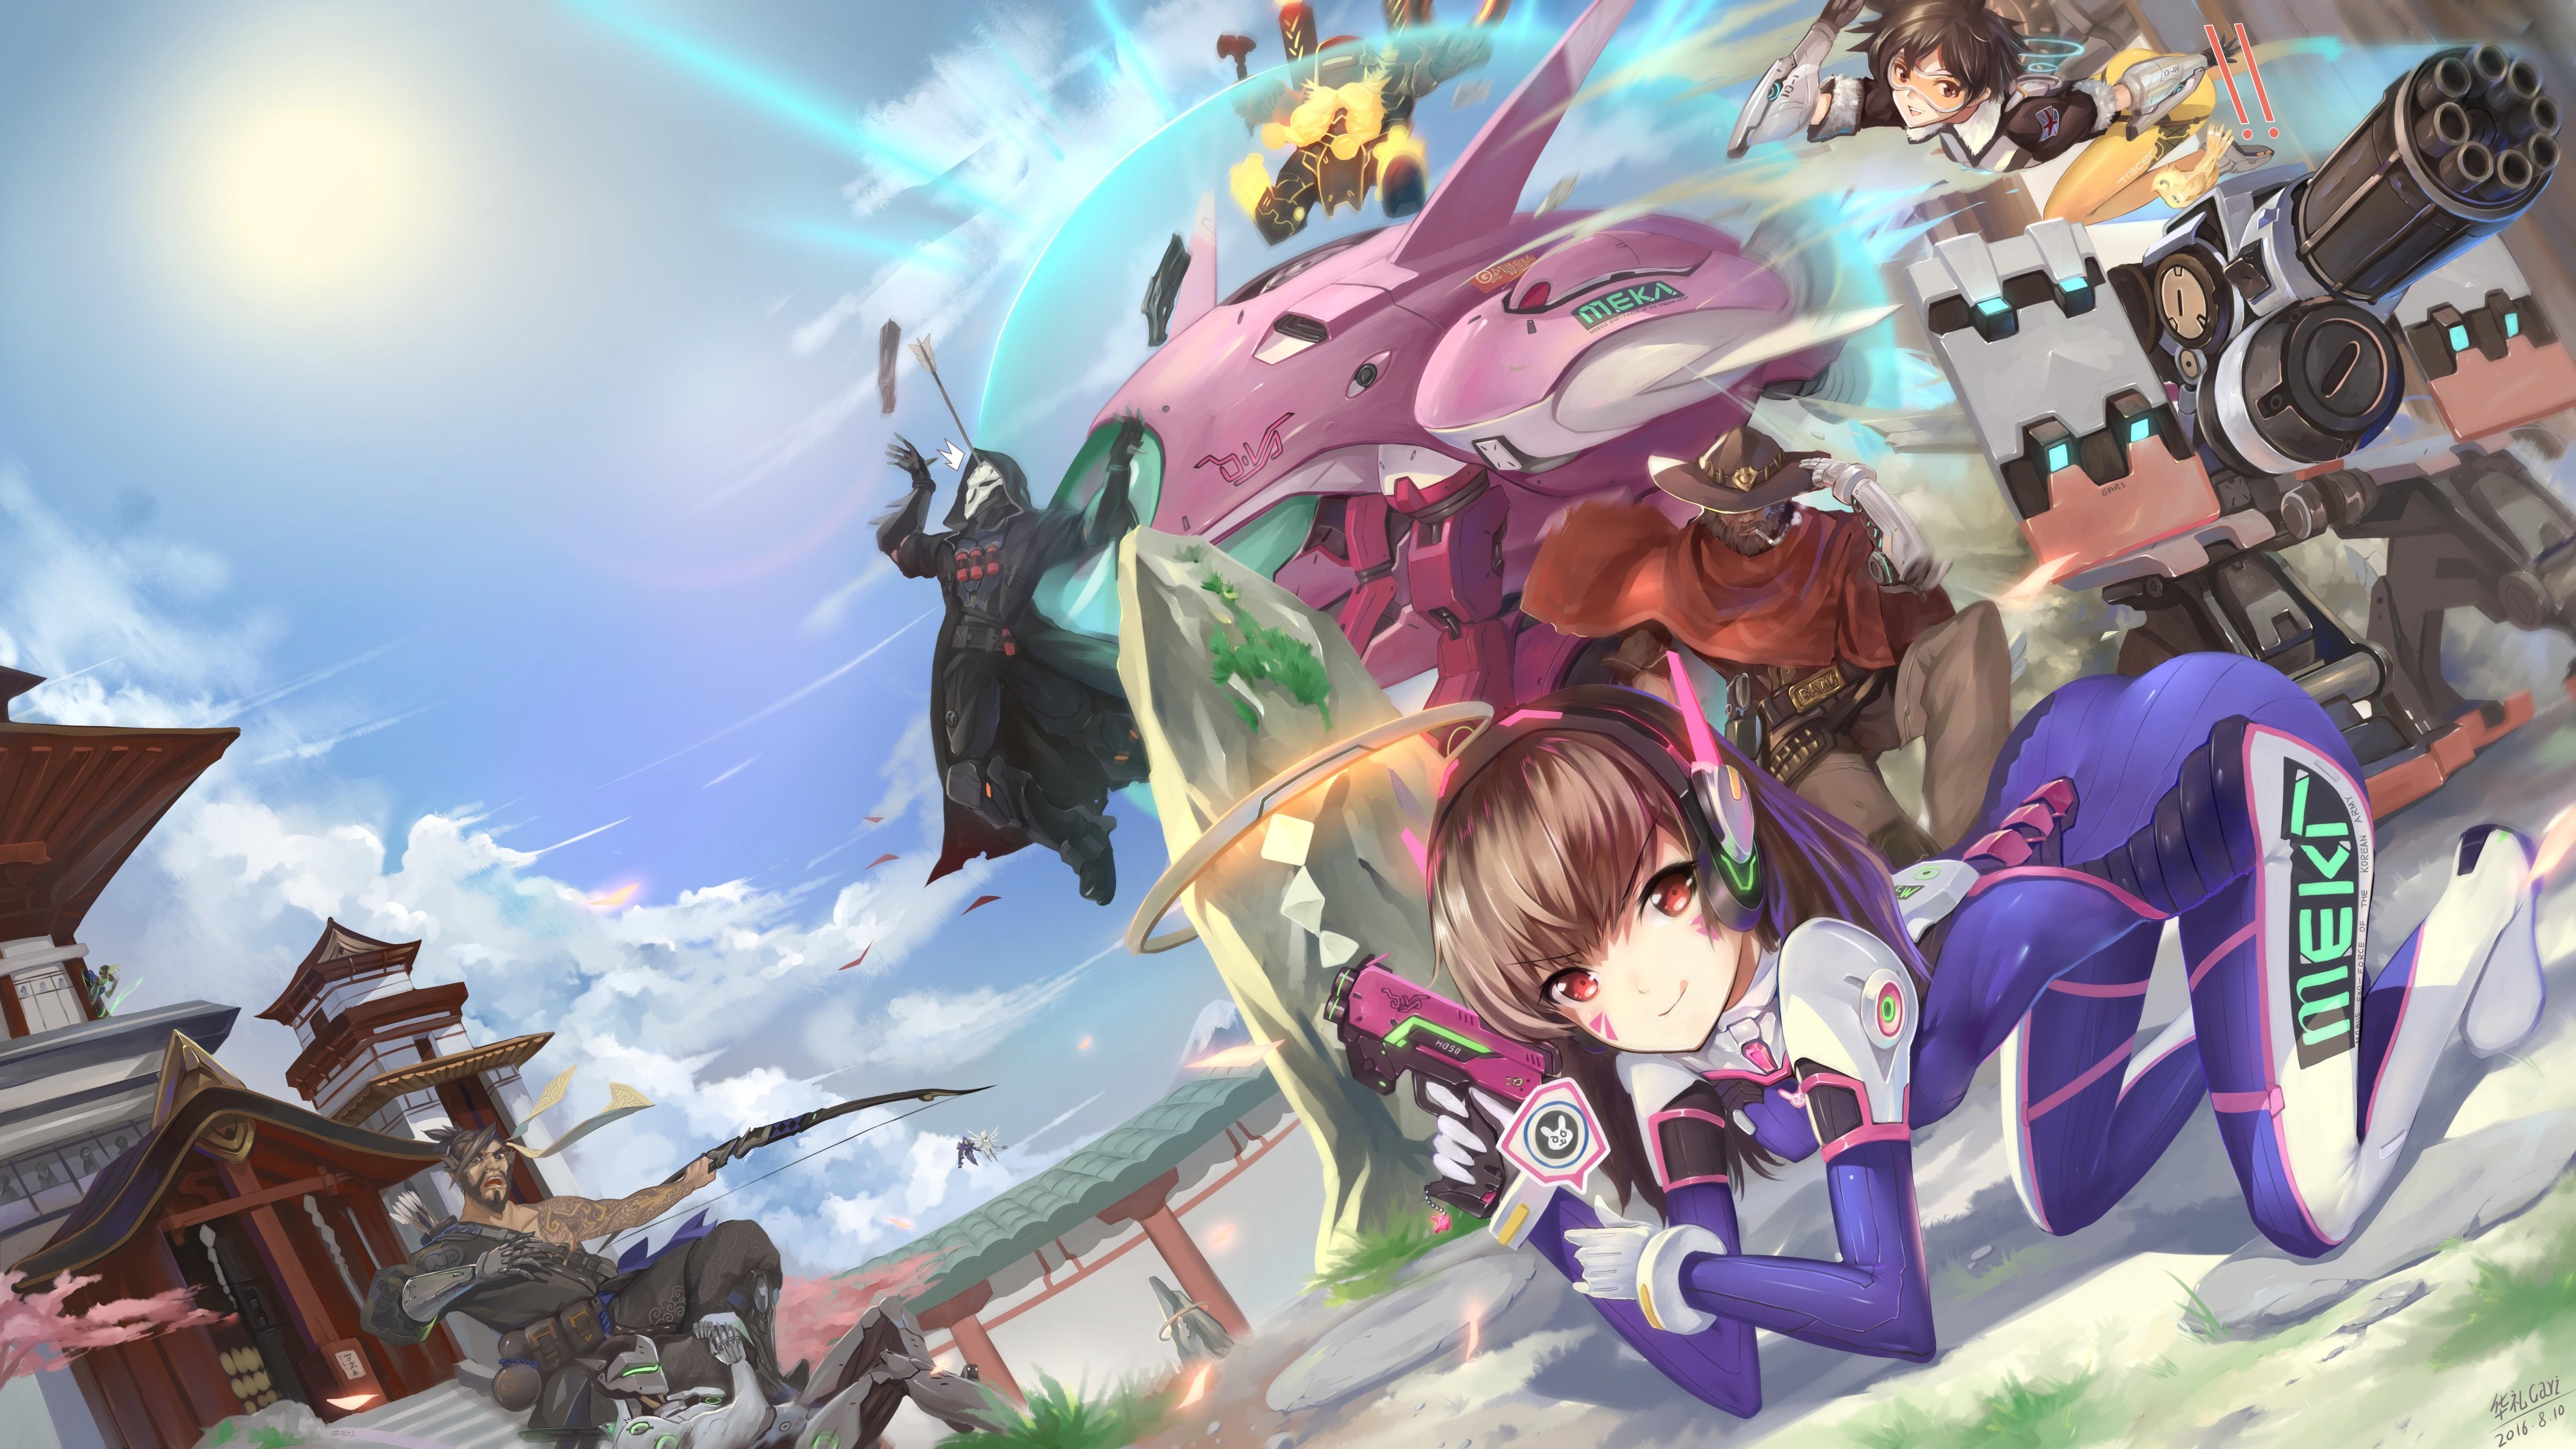 fond d'ecran anime overwatch